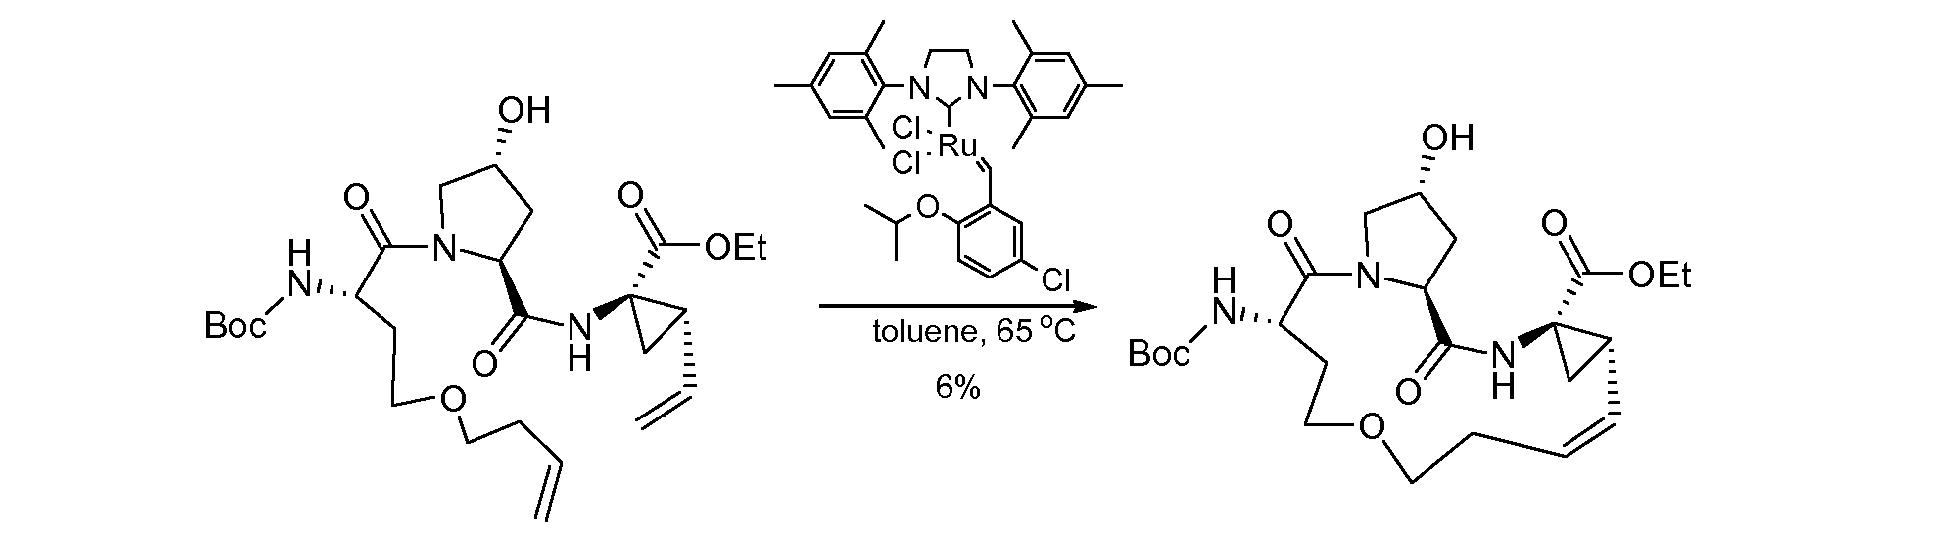 Figure imgb0516